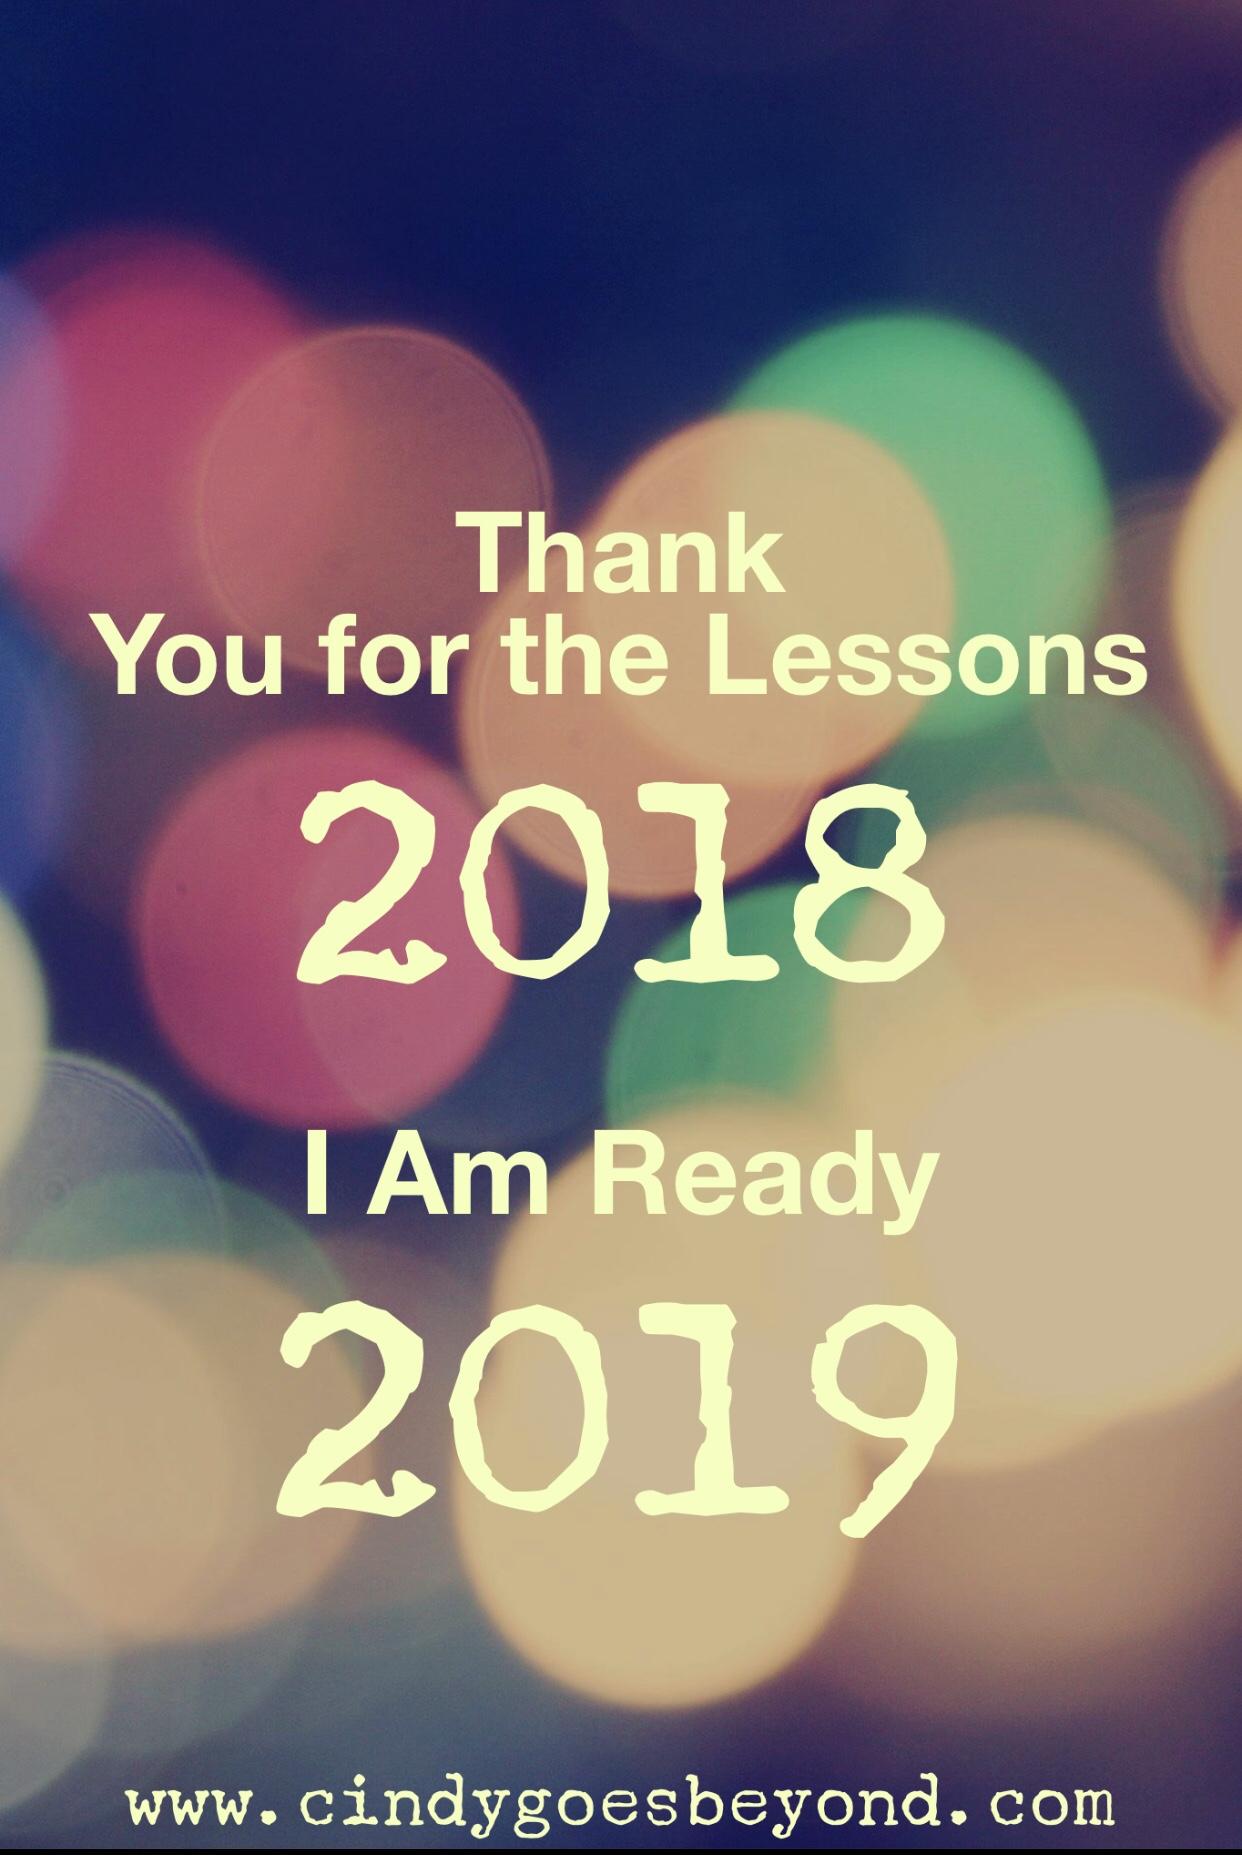 The Lesson 2019